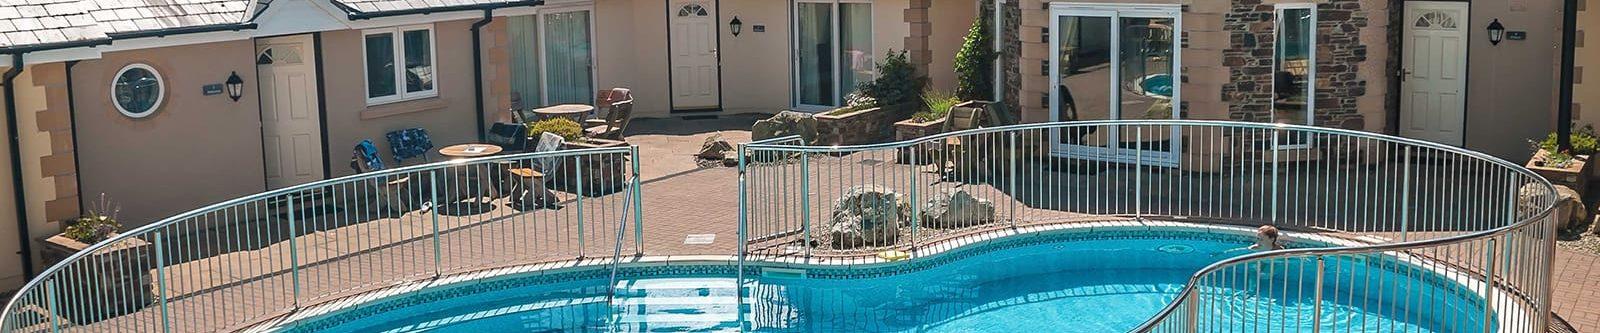 porth veor hotel swimming pool